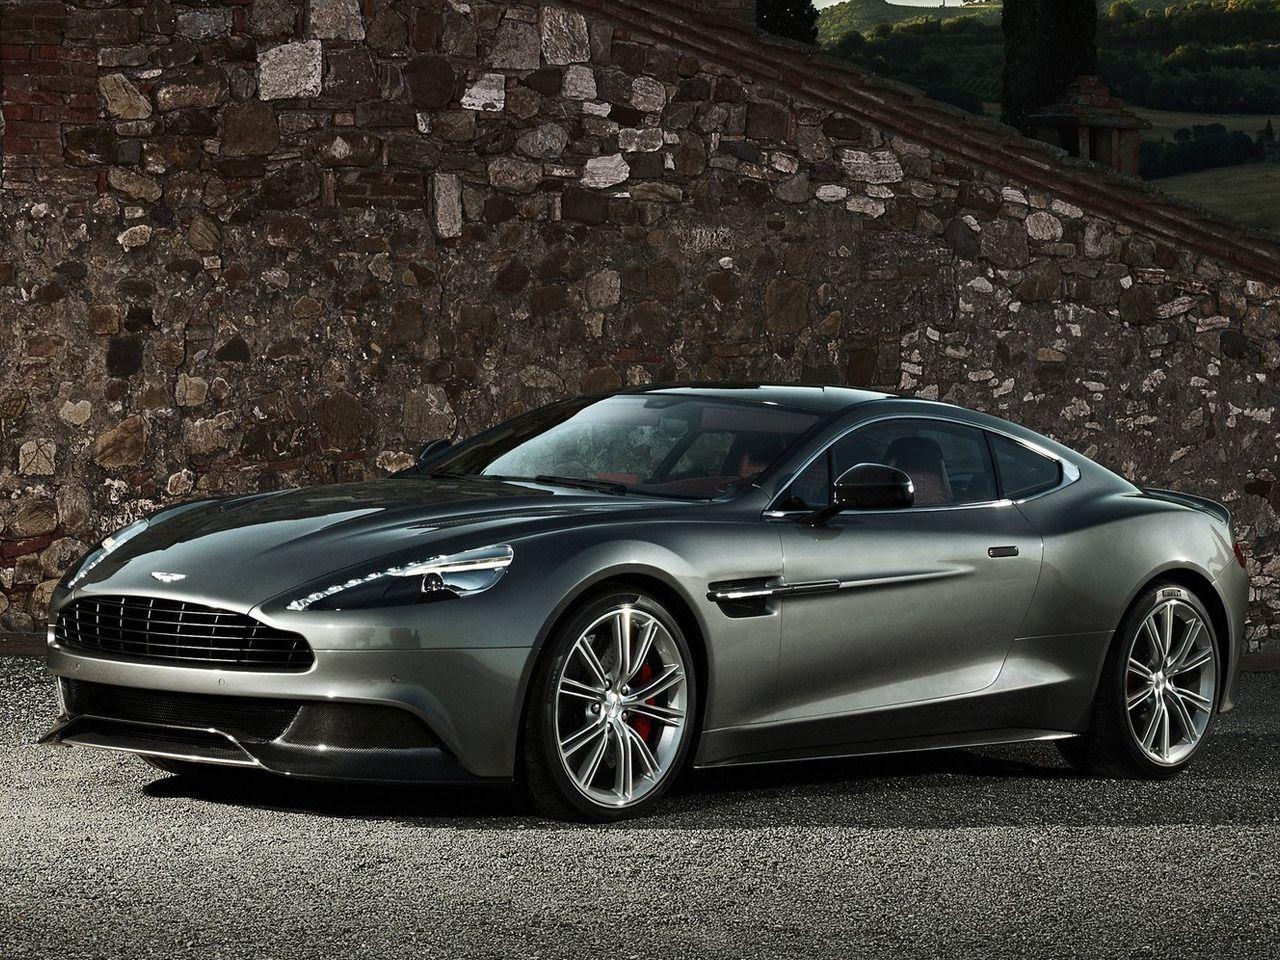 Top 10 Sports Cars List Top10sportscarsinmalaysia Aston Martin Vanquish Aston Martin New Aston Martin